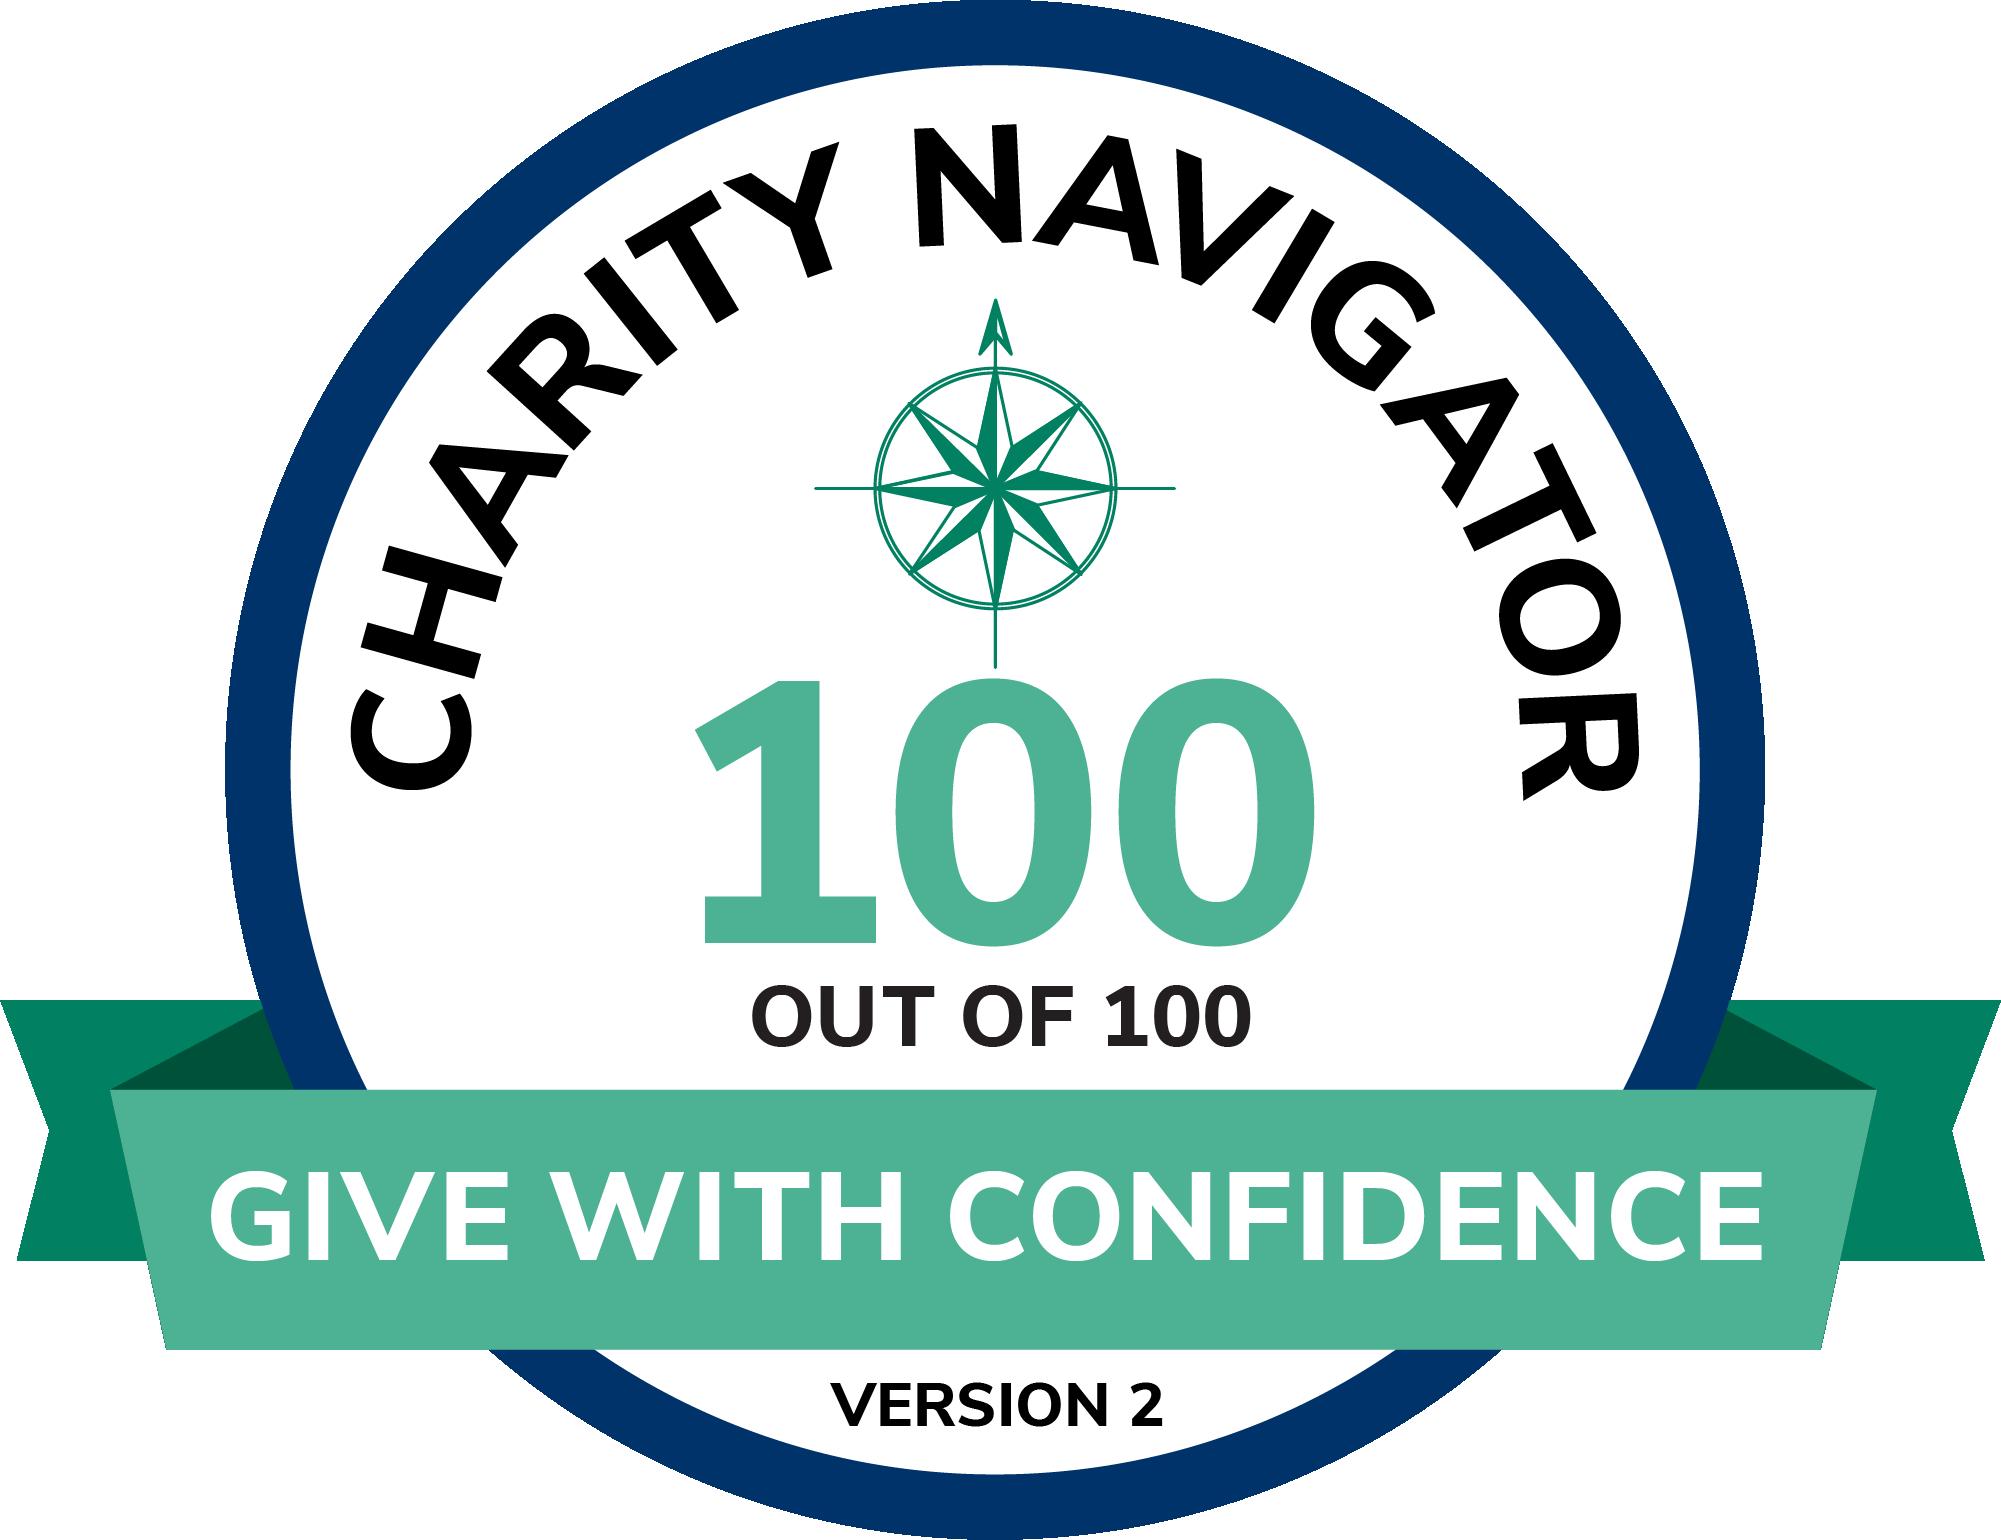 Charity Navigator 100